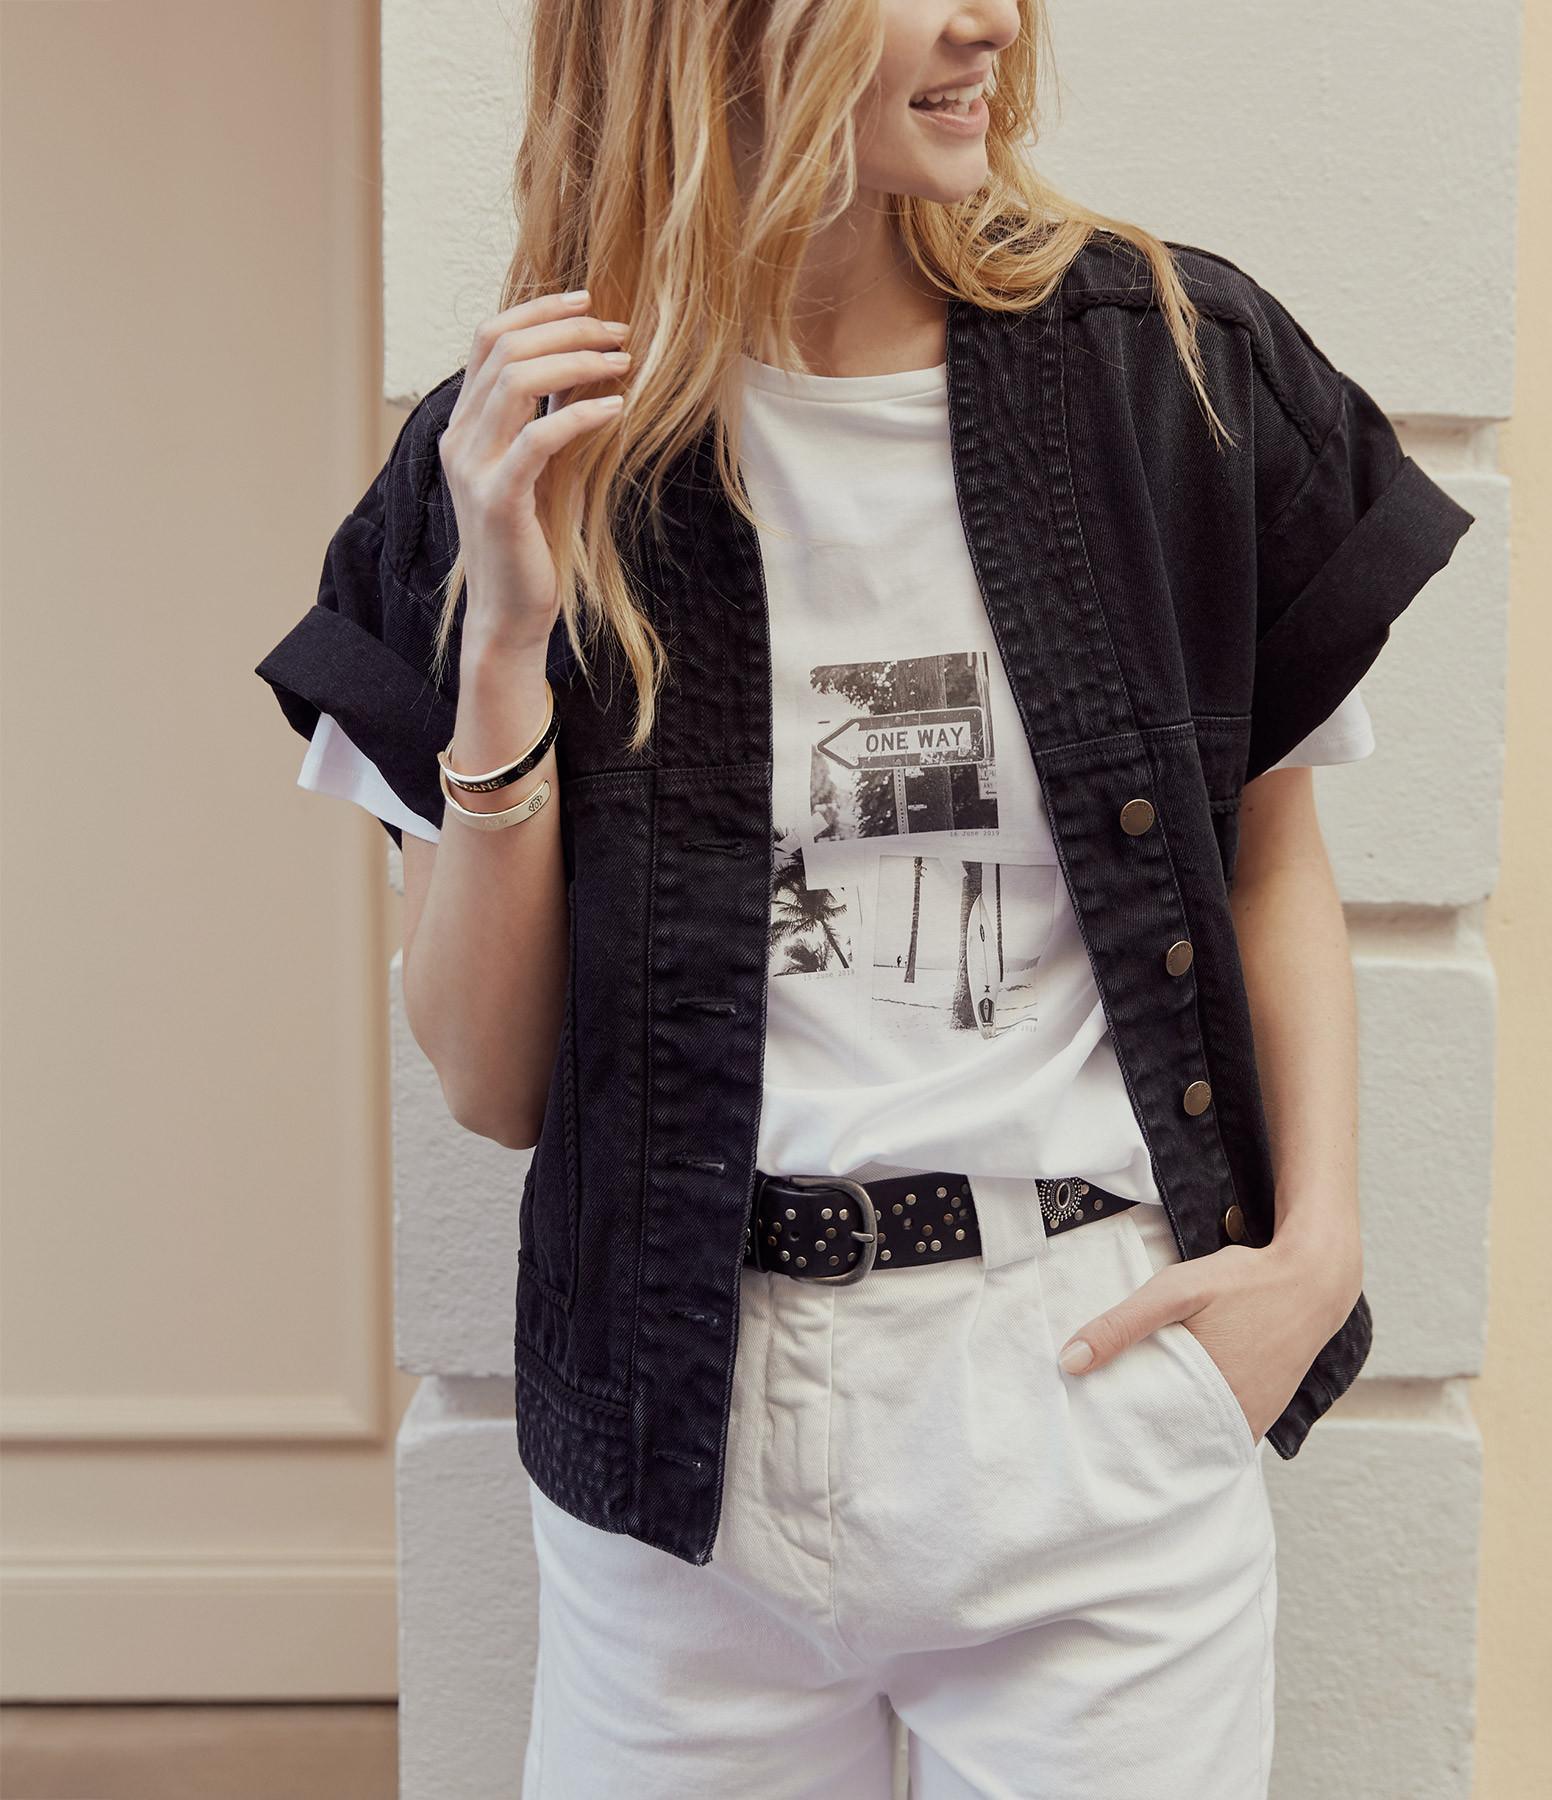 JEANNE VOULAND - Tee-shirt Ferly Polaroïds Monochrome Blanc